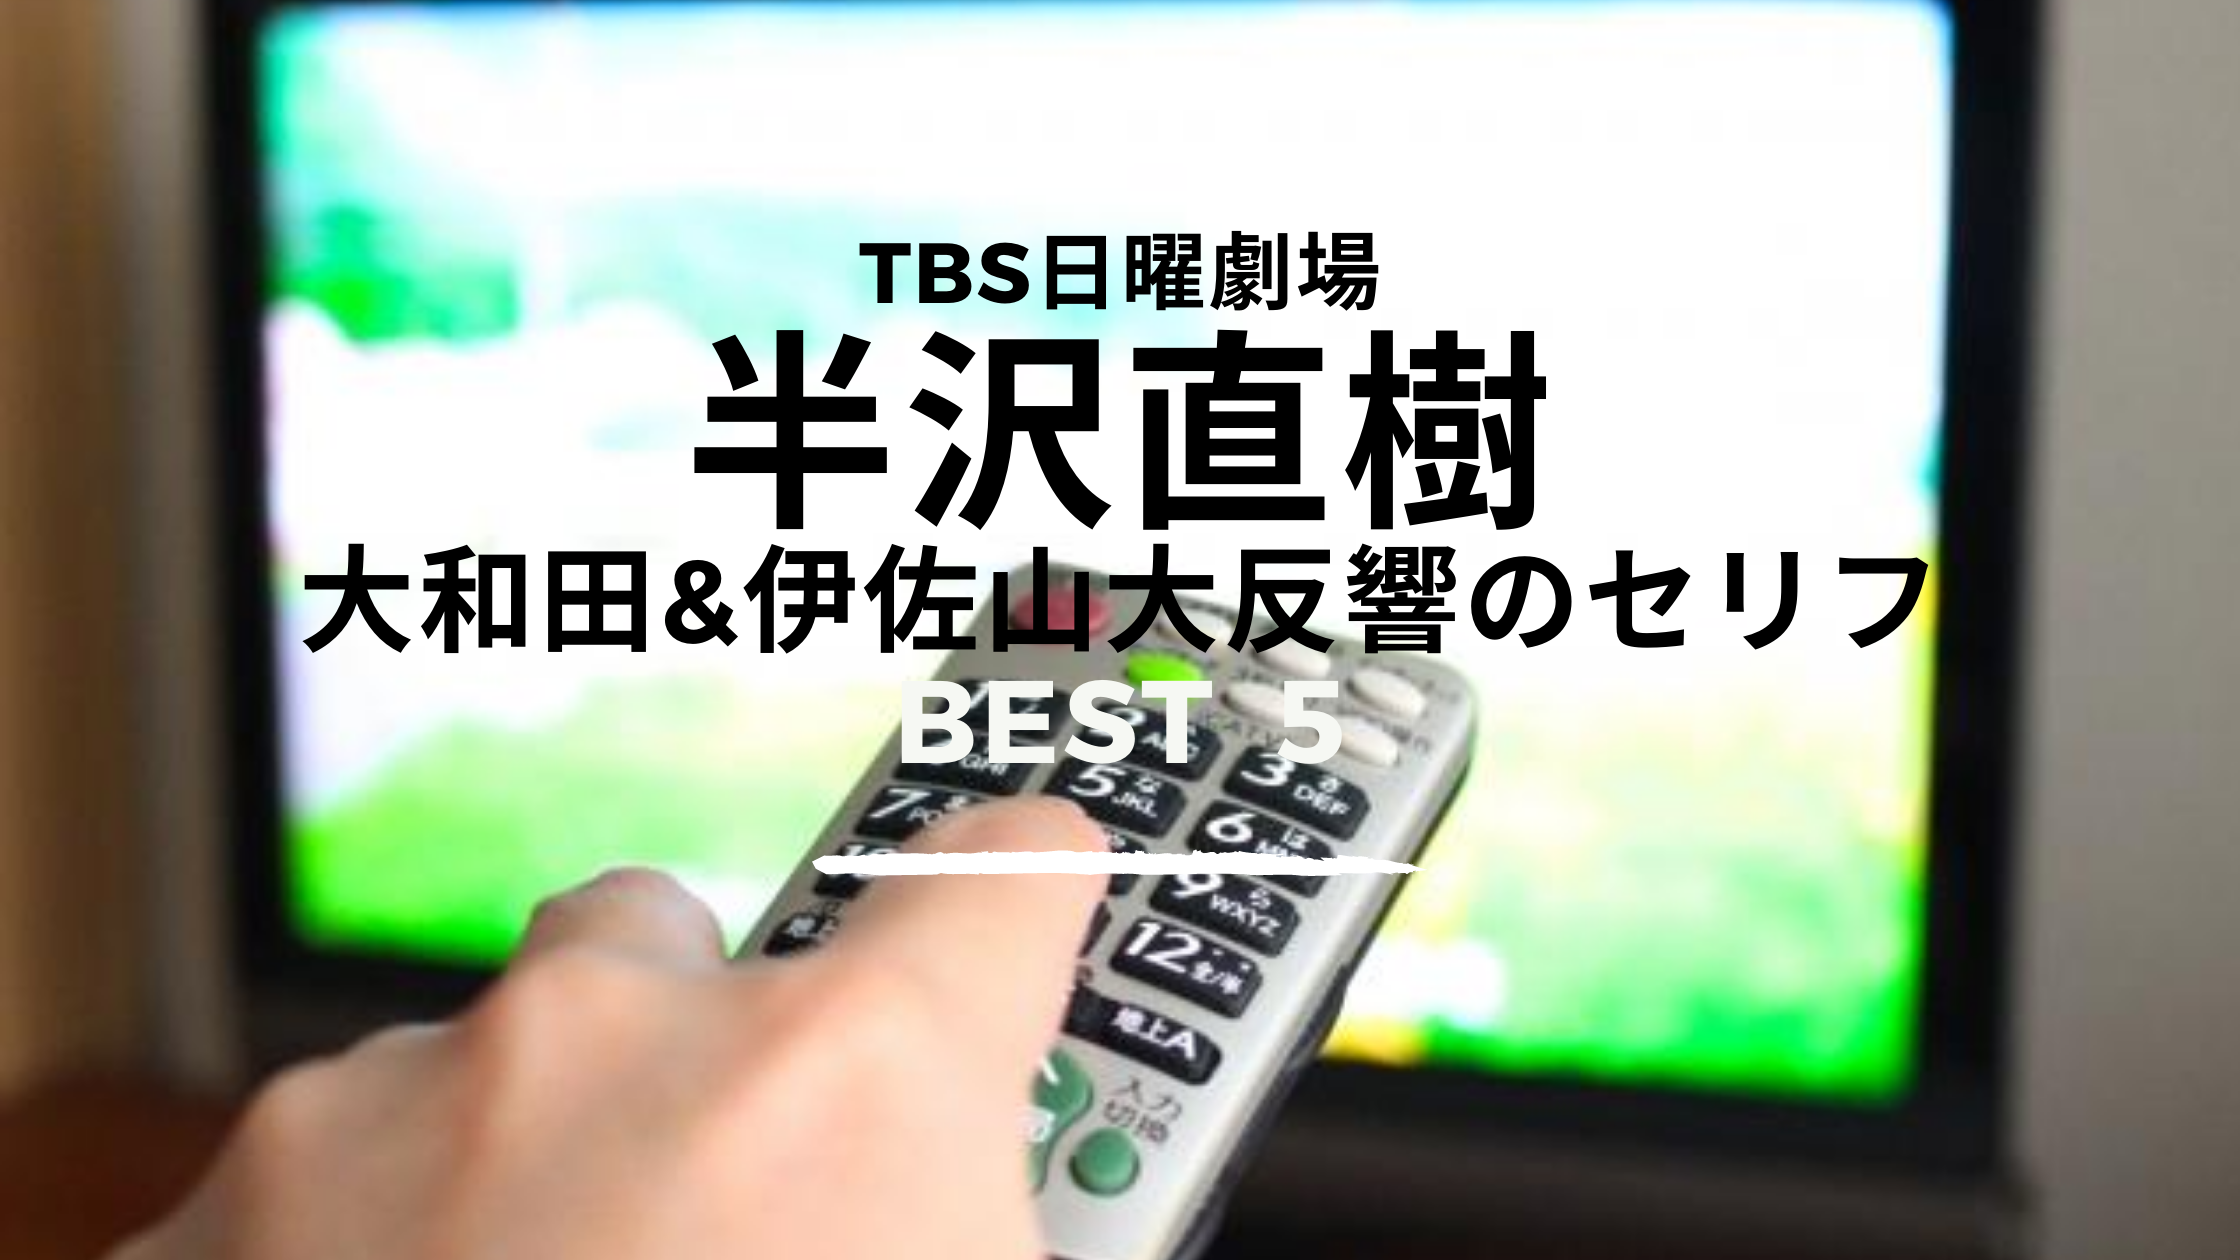 TBS日曜劇場「半沢直樹」ツイッターで反響が大きかったシーンの名セリフ BEST5